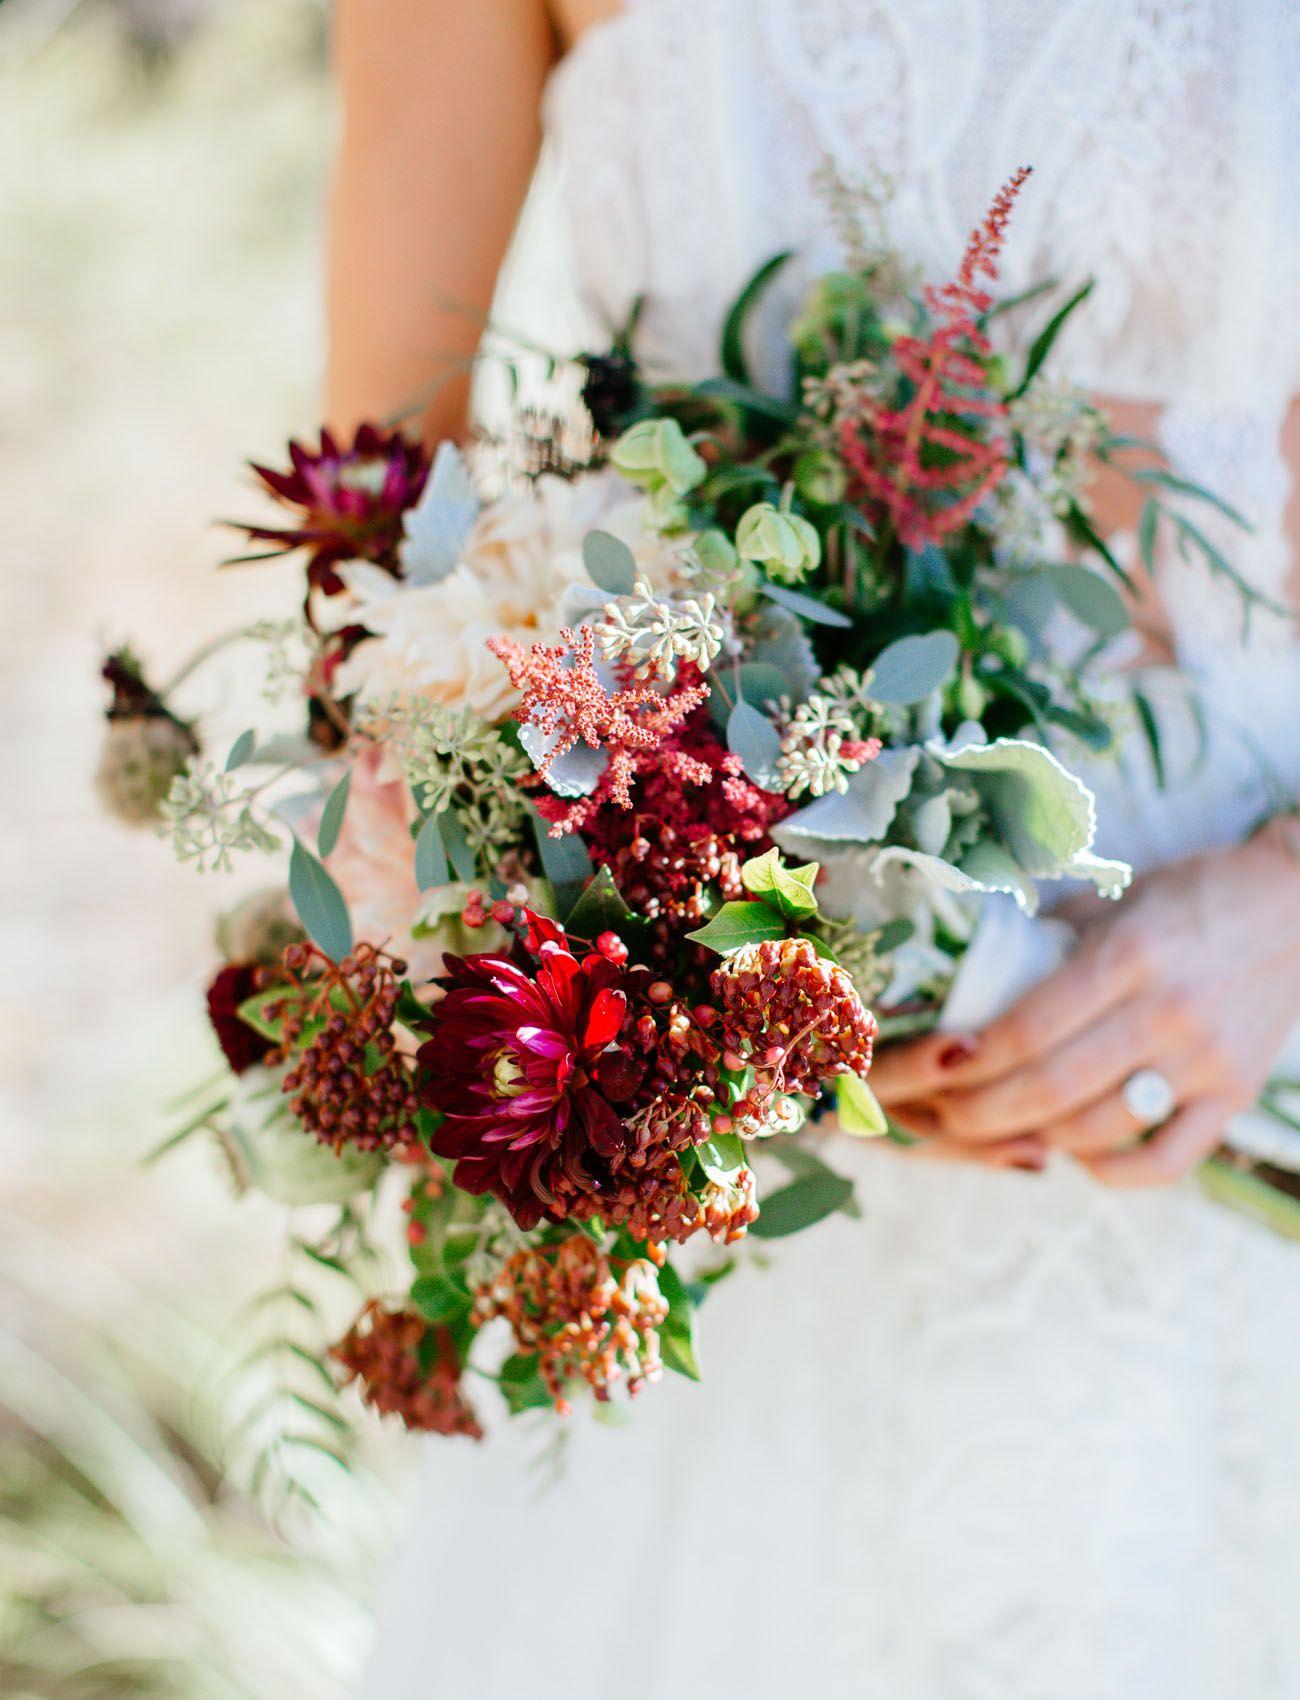 ac1428fd82b Desert Chic Wedding with Bold Embroidered Bridesmaids Dresses - Green  Wedding Shoes. burgundy desert bouquet